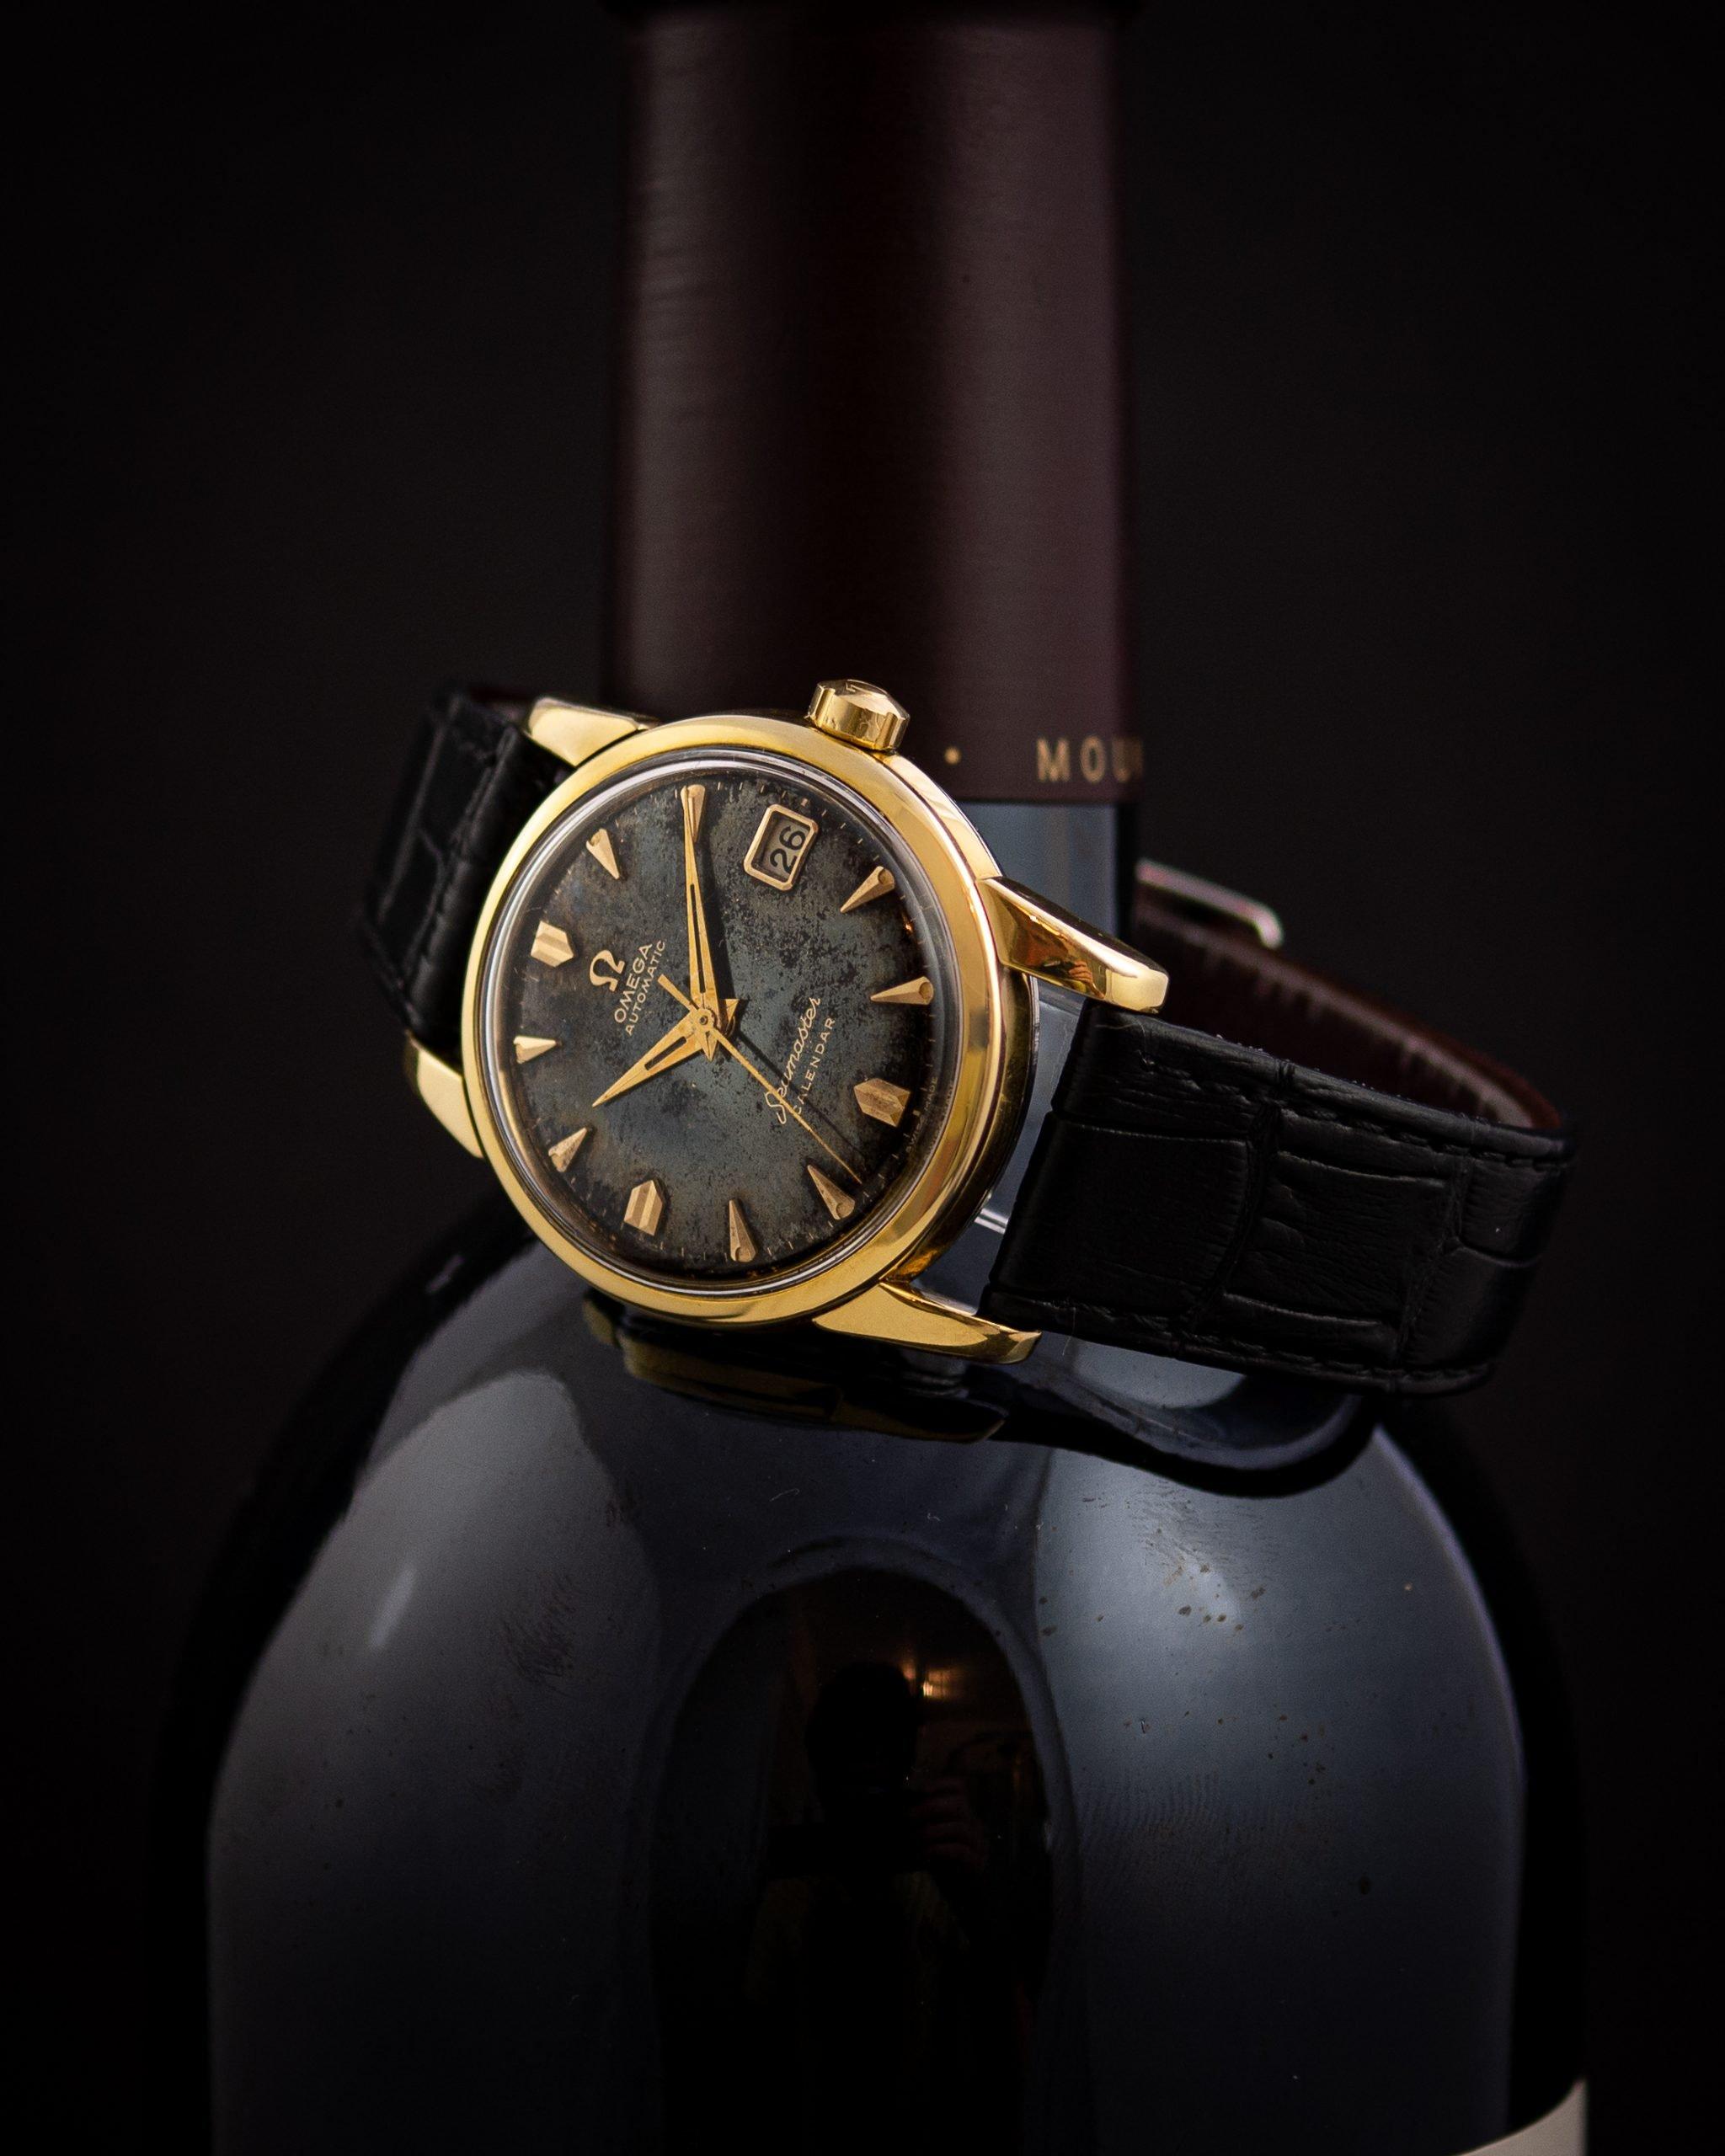 Vintage Omega Seamaster Automatic ref. 2849-6 SC black dial